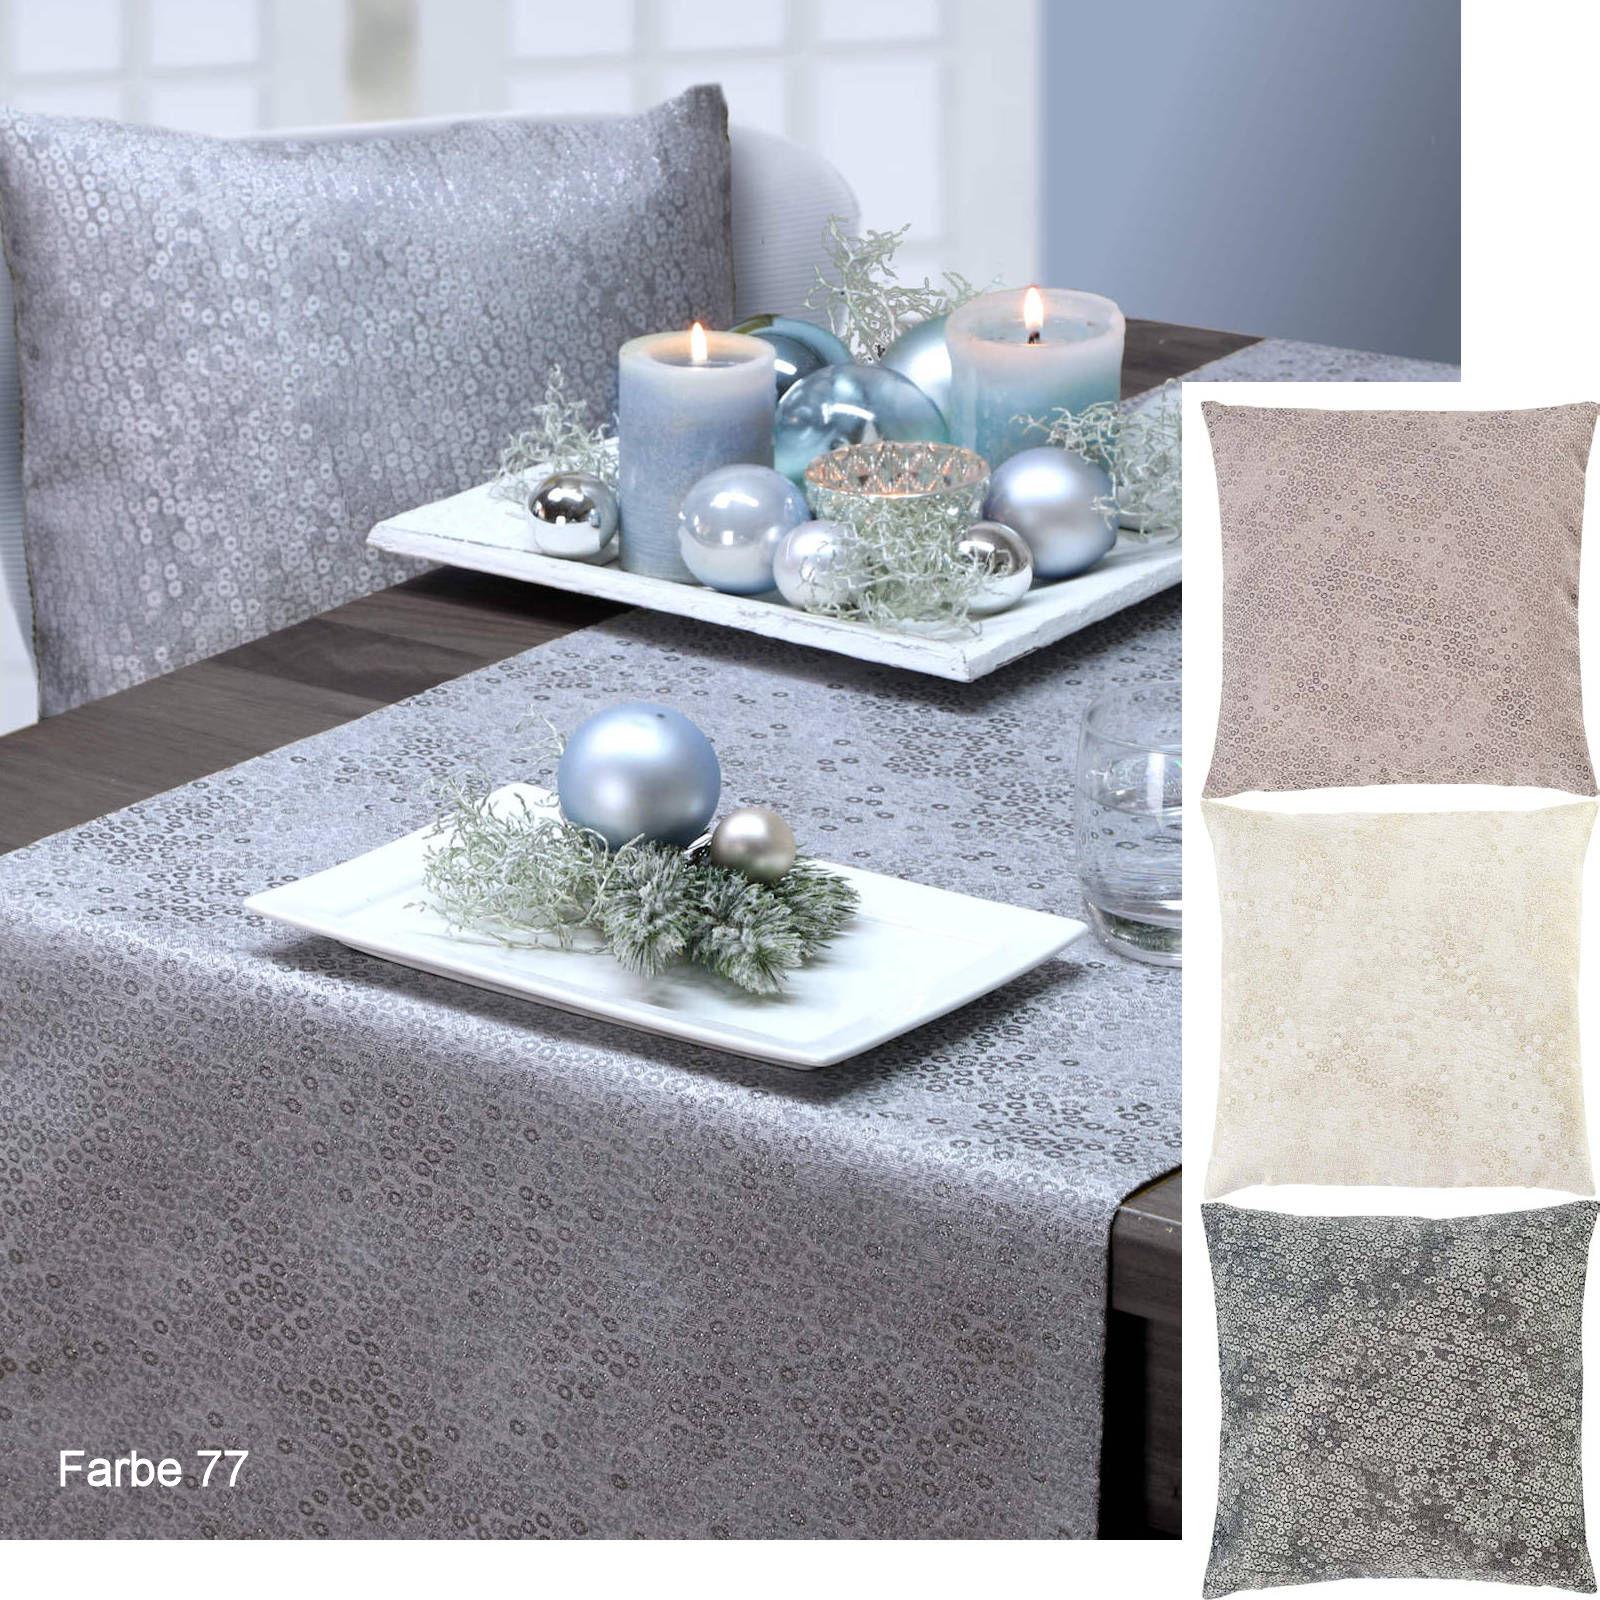 festliche Mitteldecke CIRCOLO von Sander table and home, Farbe 75